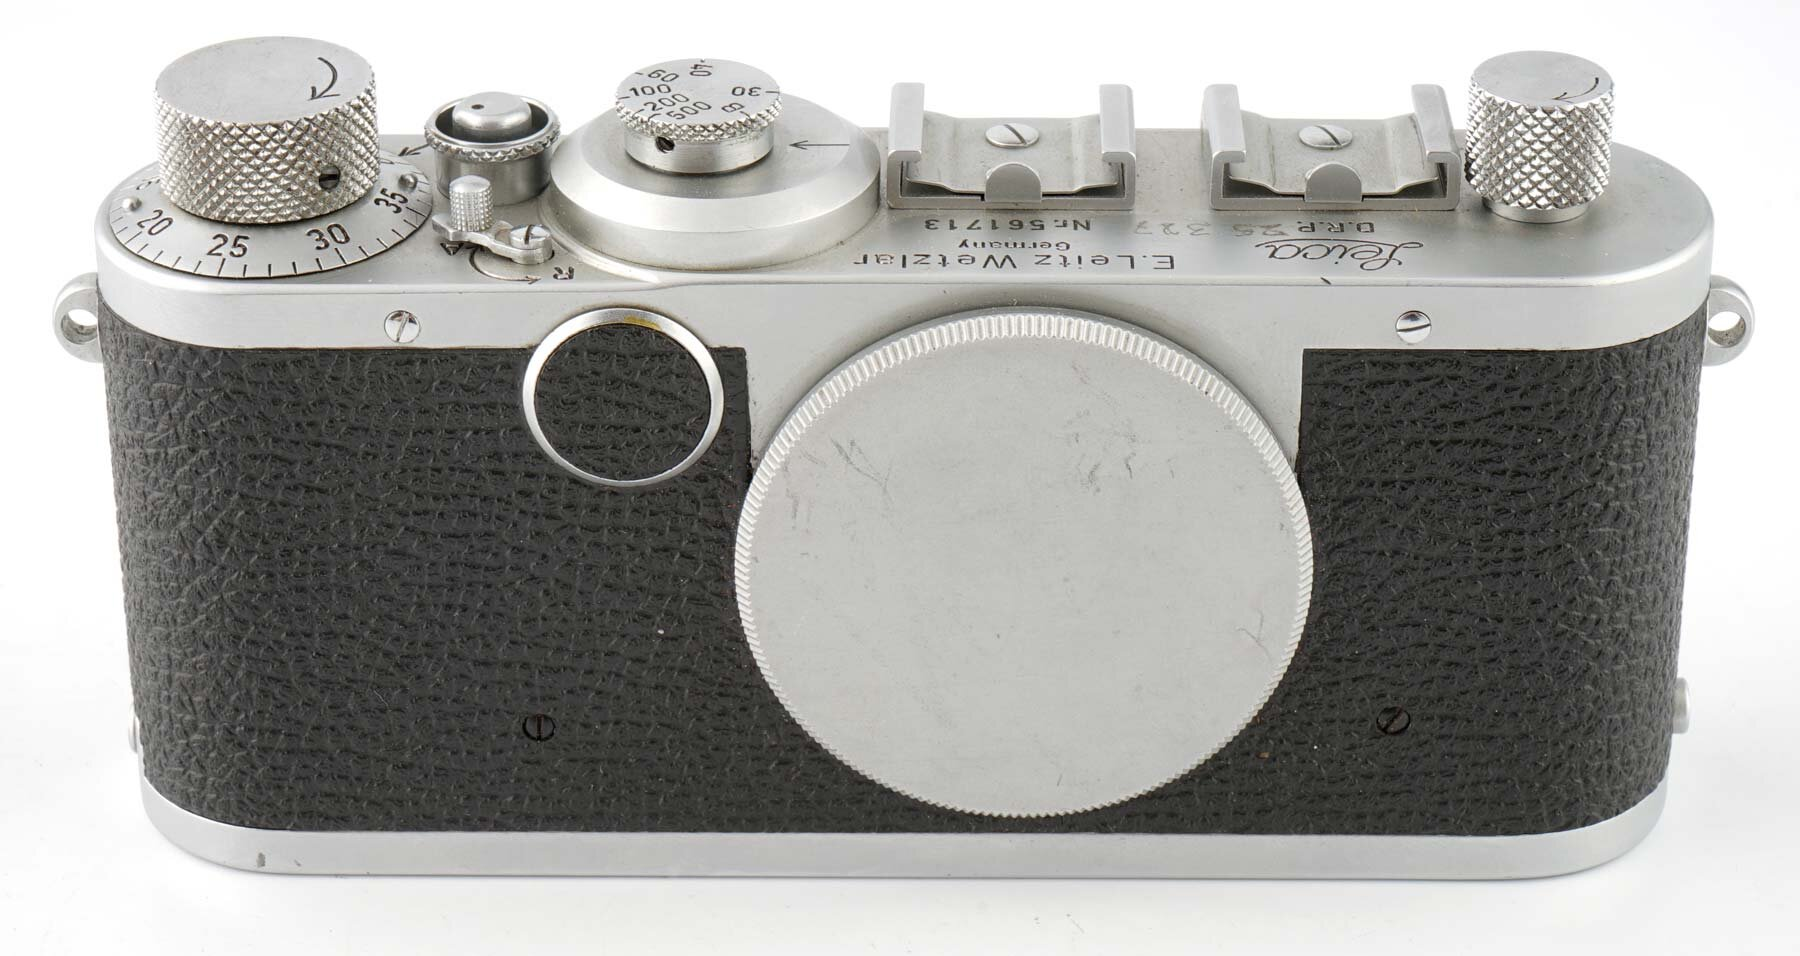 Leica Ic Gehäuse silber 1951